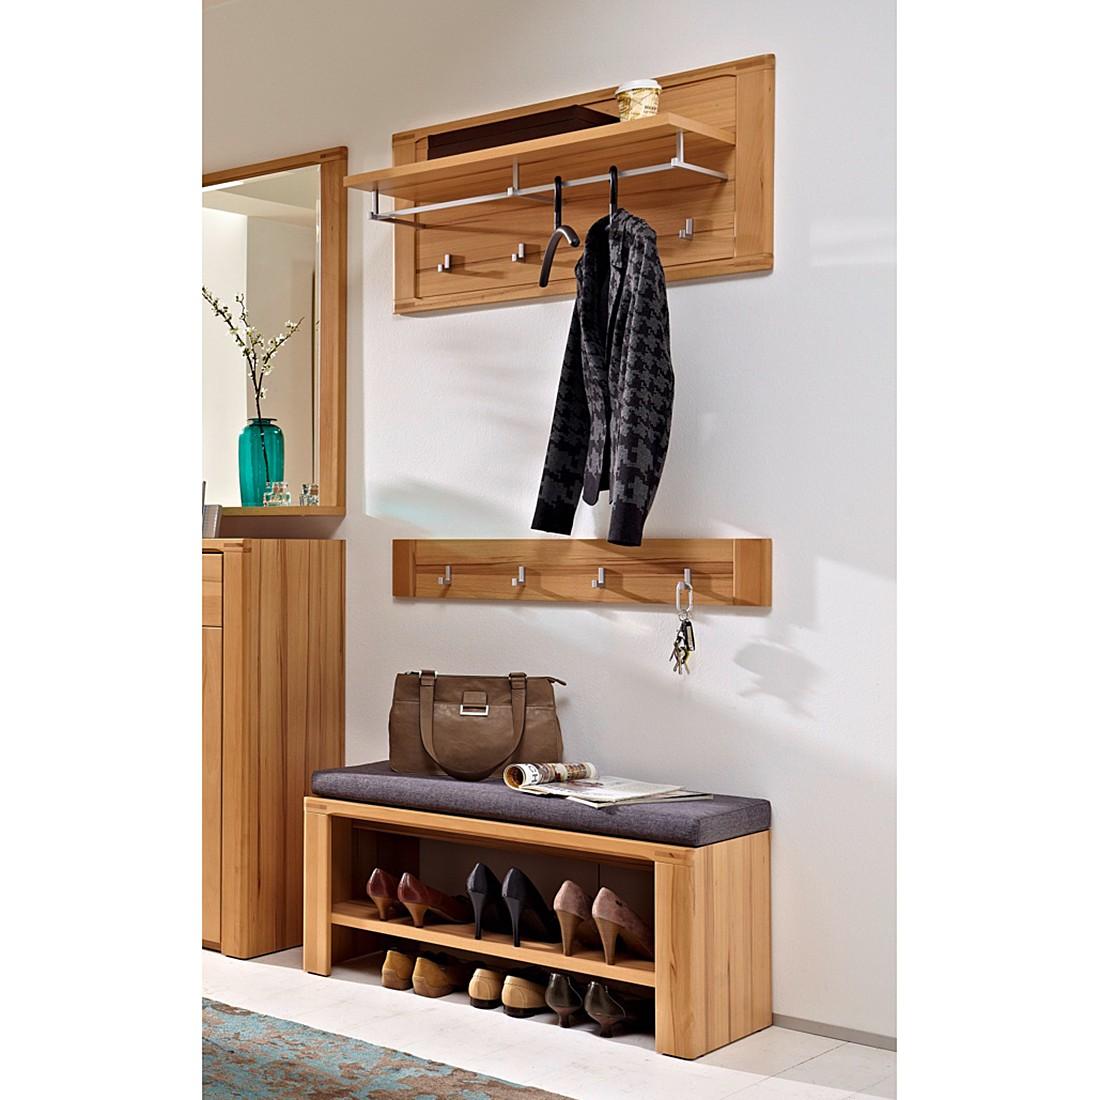 garderobenset naturestar 3 teilig kernbuche teilmassiv. Black Bedroom Furniture Sets. Home Design Ideas